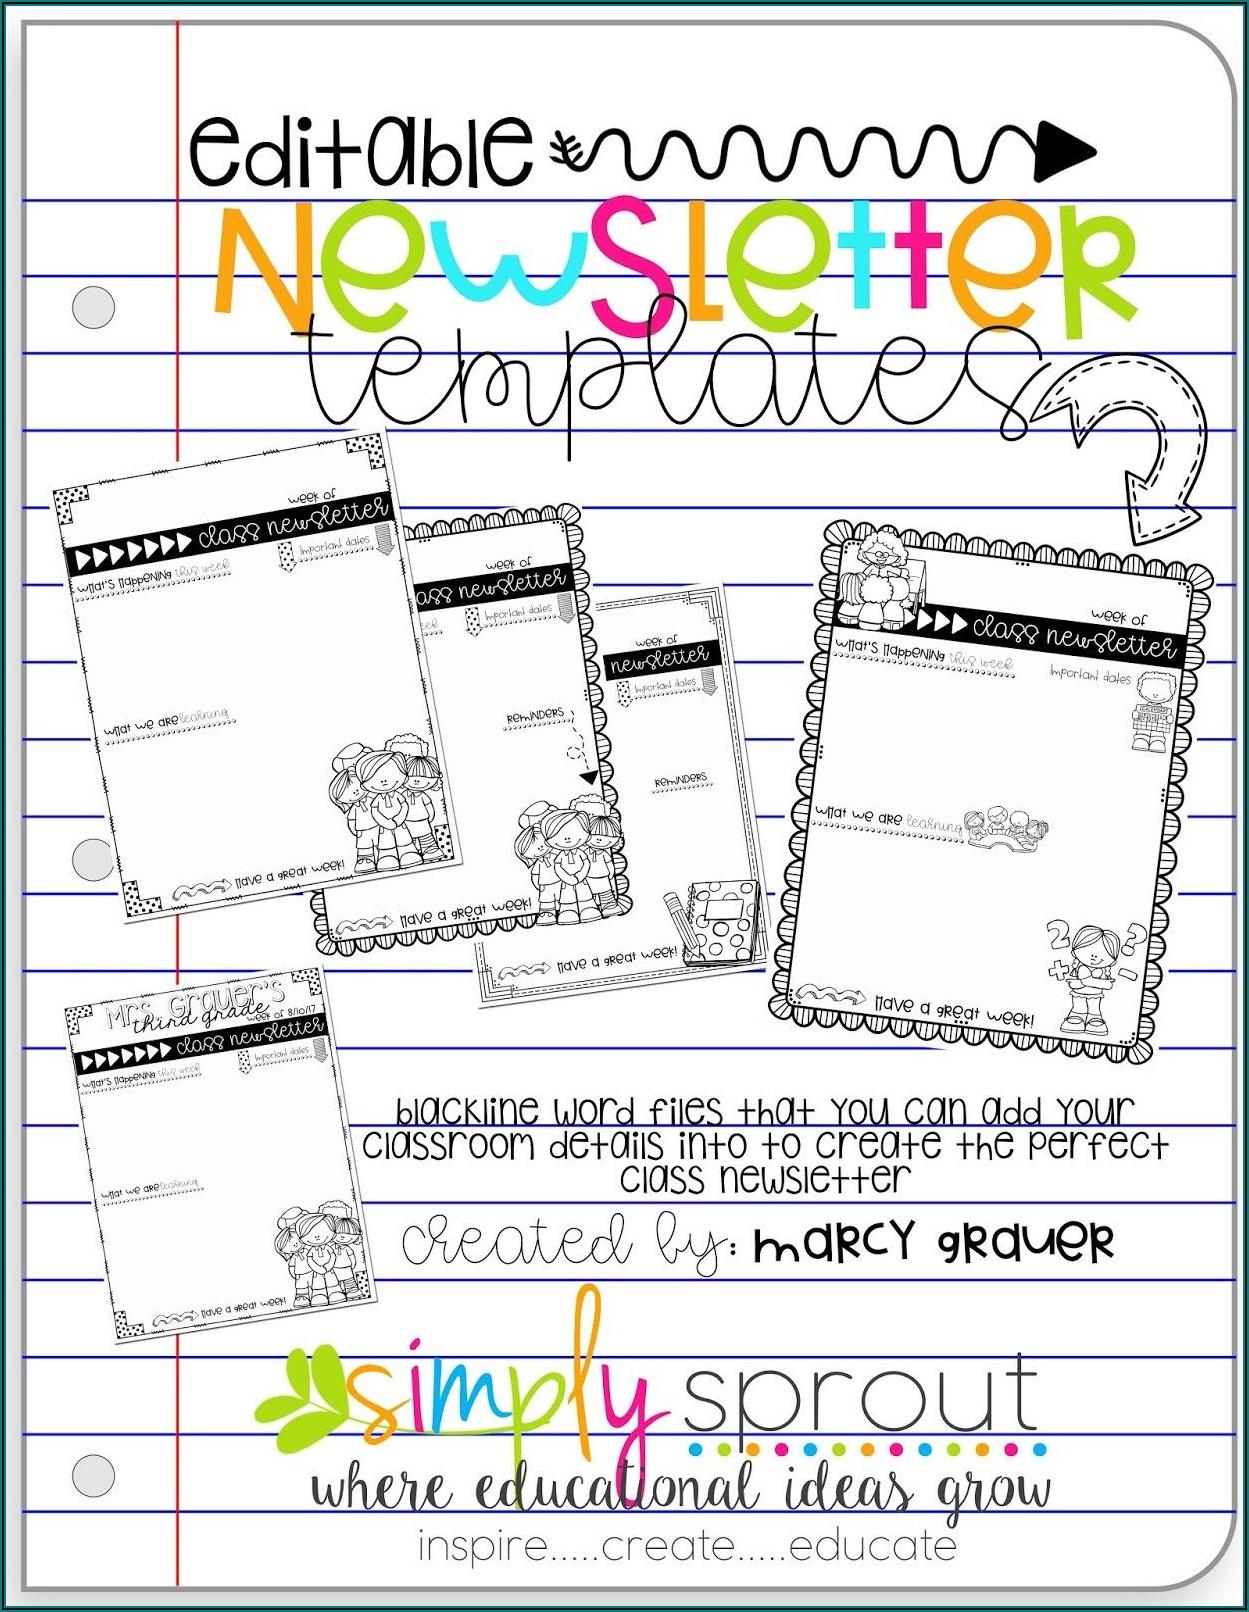 Editable School Newsletter Templates Free